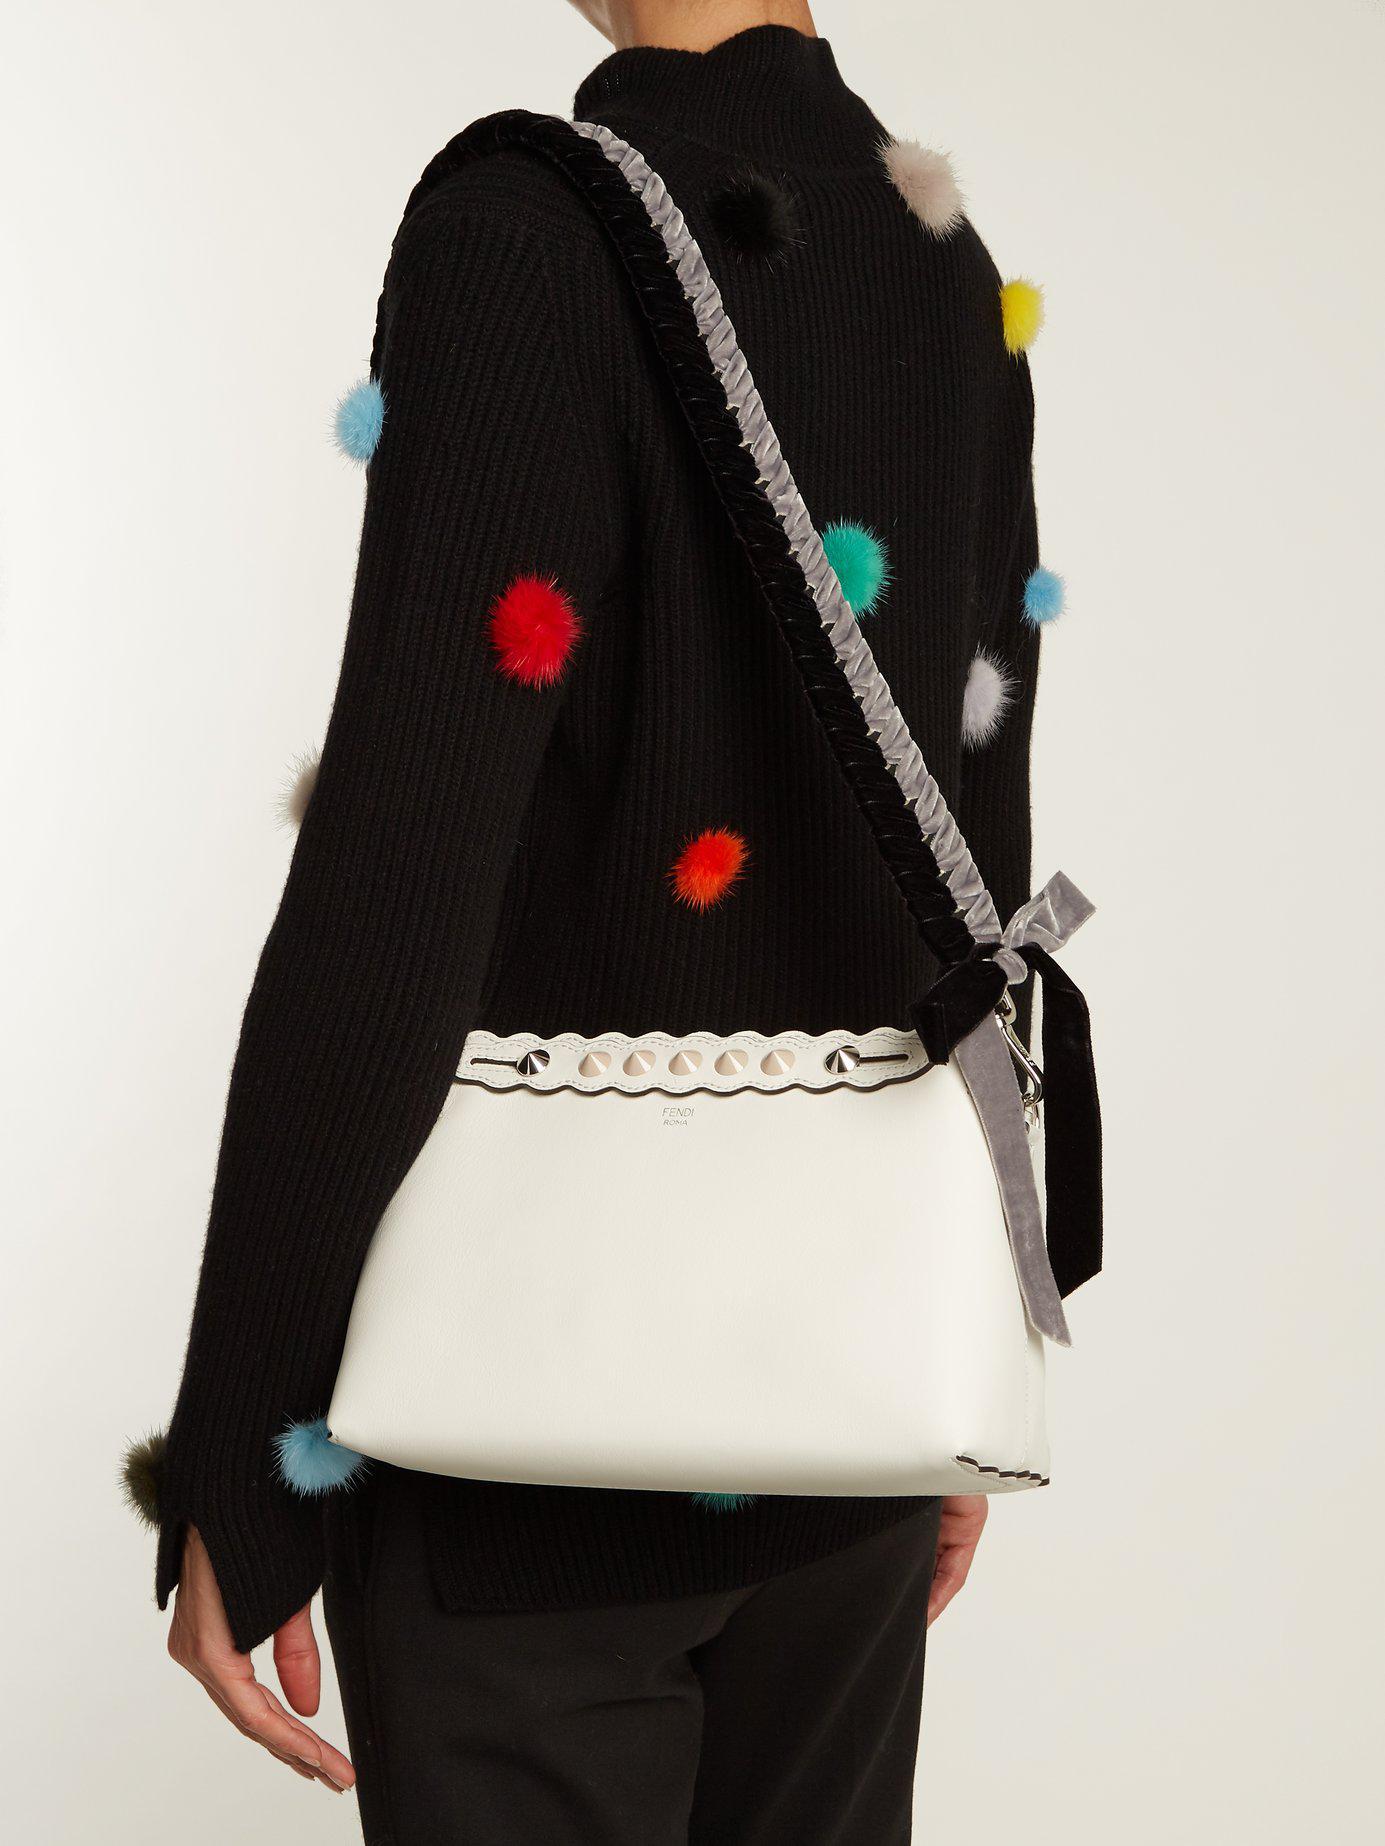 e826c1f1c95b Lyst - Fendi Strap You Whipstitched Ribbon Bag Strap in Black - Save 77%